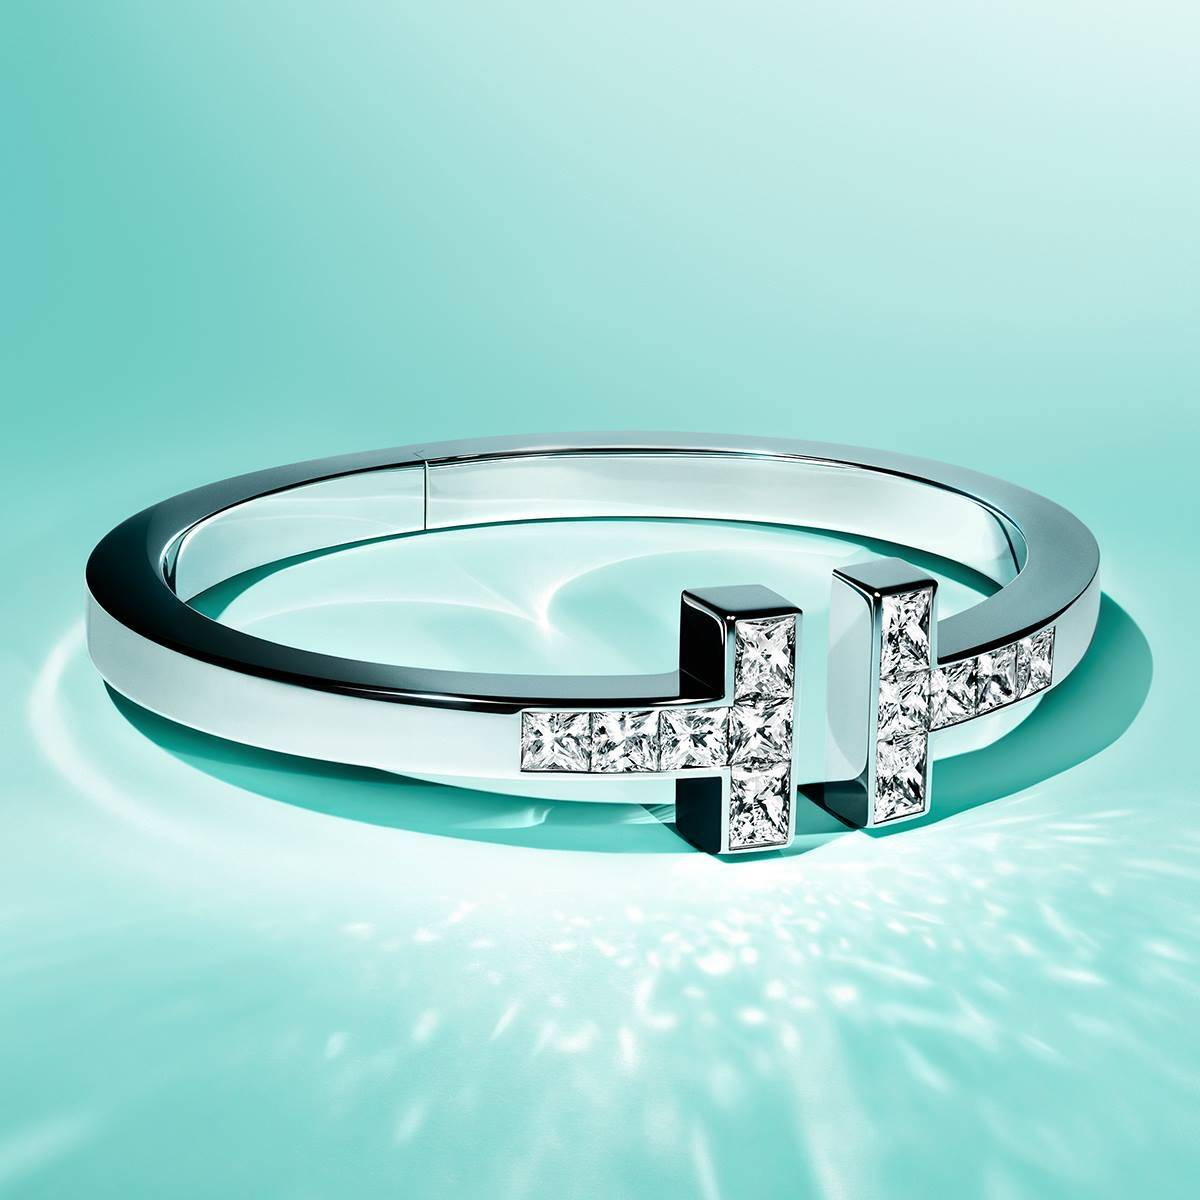 Tiffany T Square Bracelet Reimagined With Diamonds Senatus